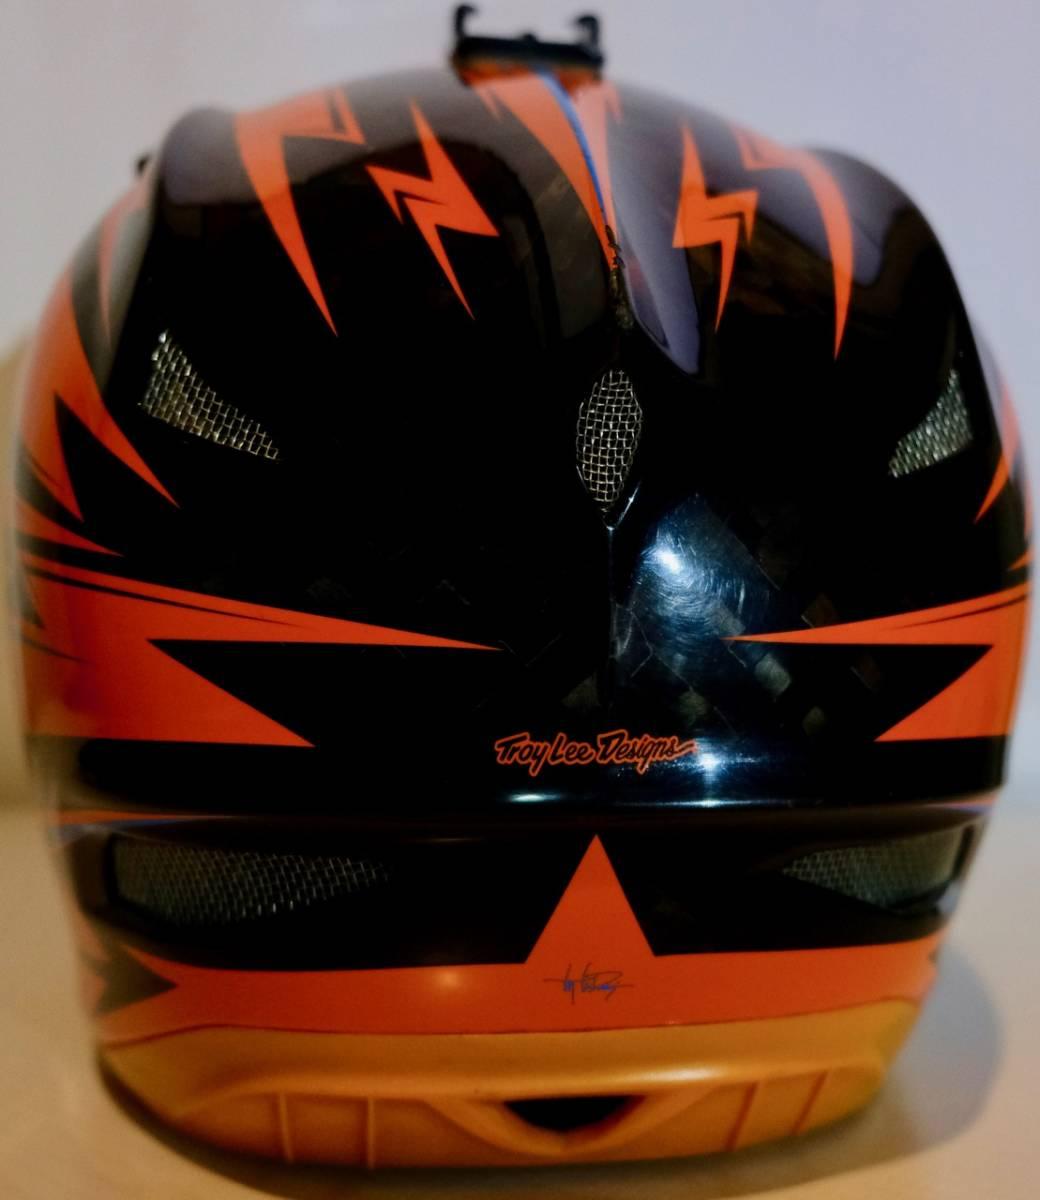 Troy lee designs D3 カーボン (L) トロイリーデザイン ヘルメット BMX MTB tld_画像2